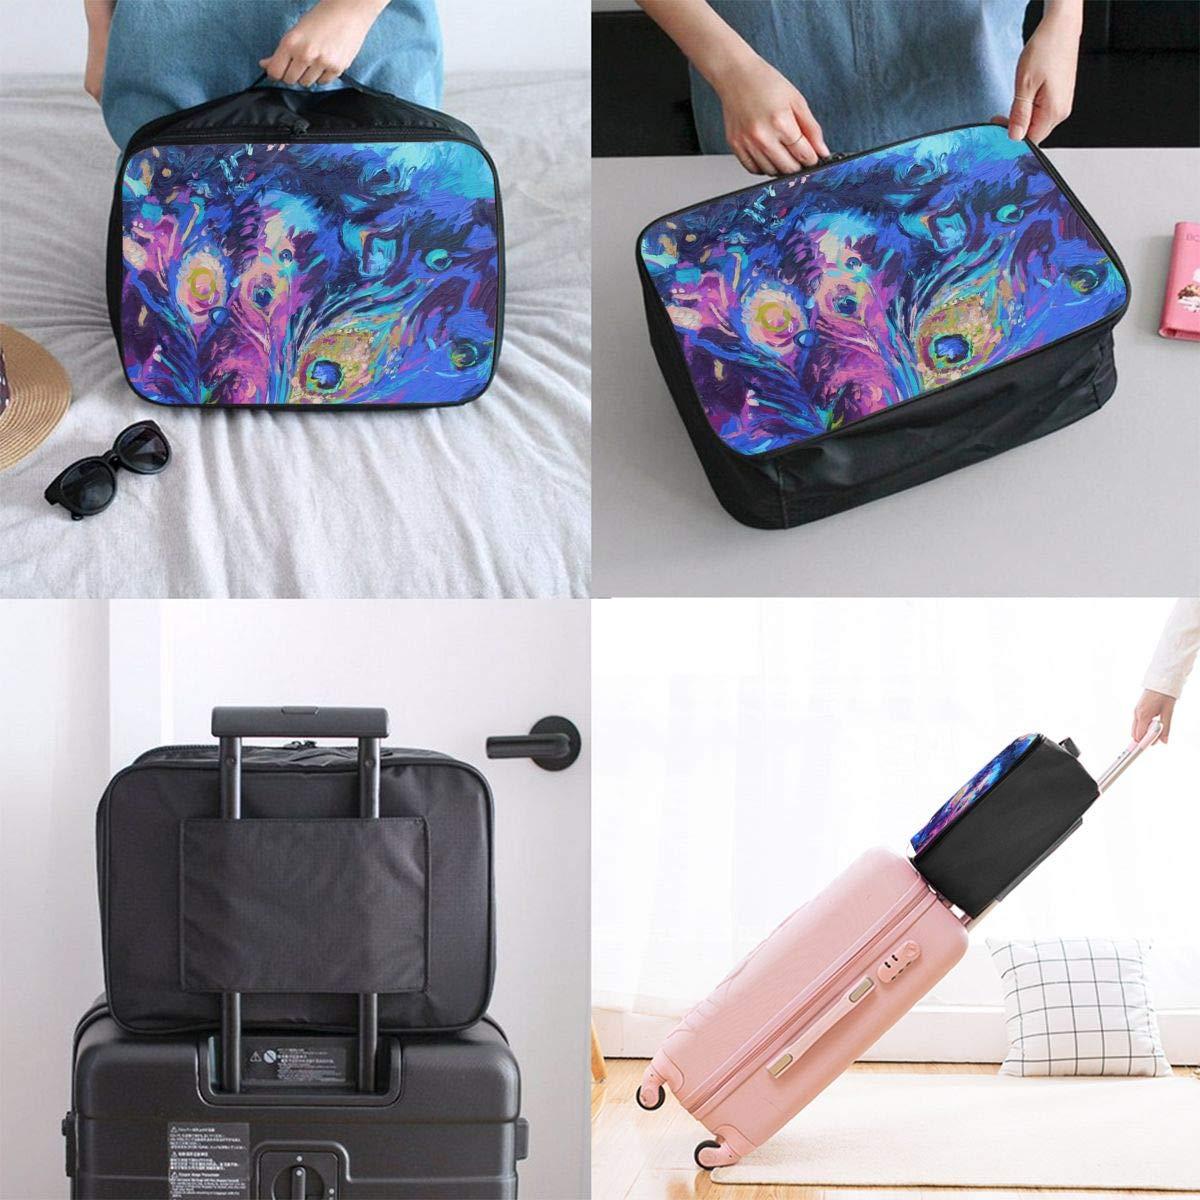 Travel Luggage Duffle Bag Lightweight Portable Handbag Fantasy Feathers Print Large Capacity Waterproof Foldable Storage Tote